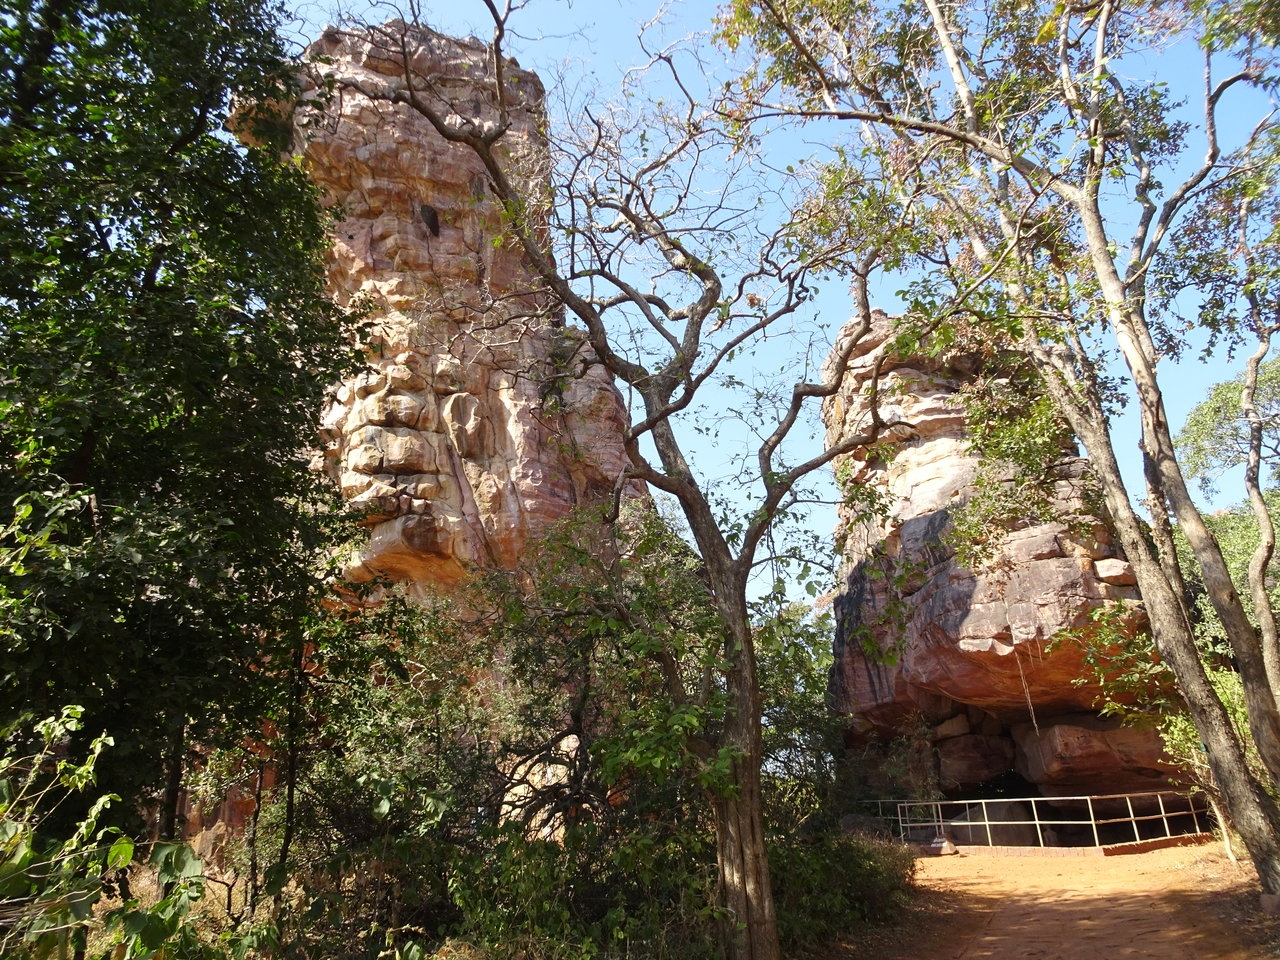 Bhimbhetka cave